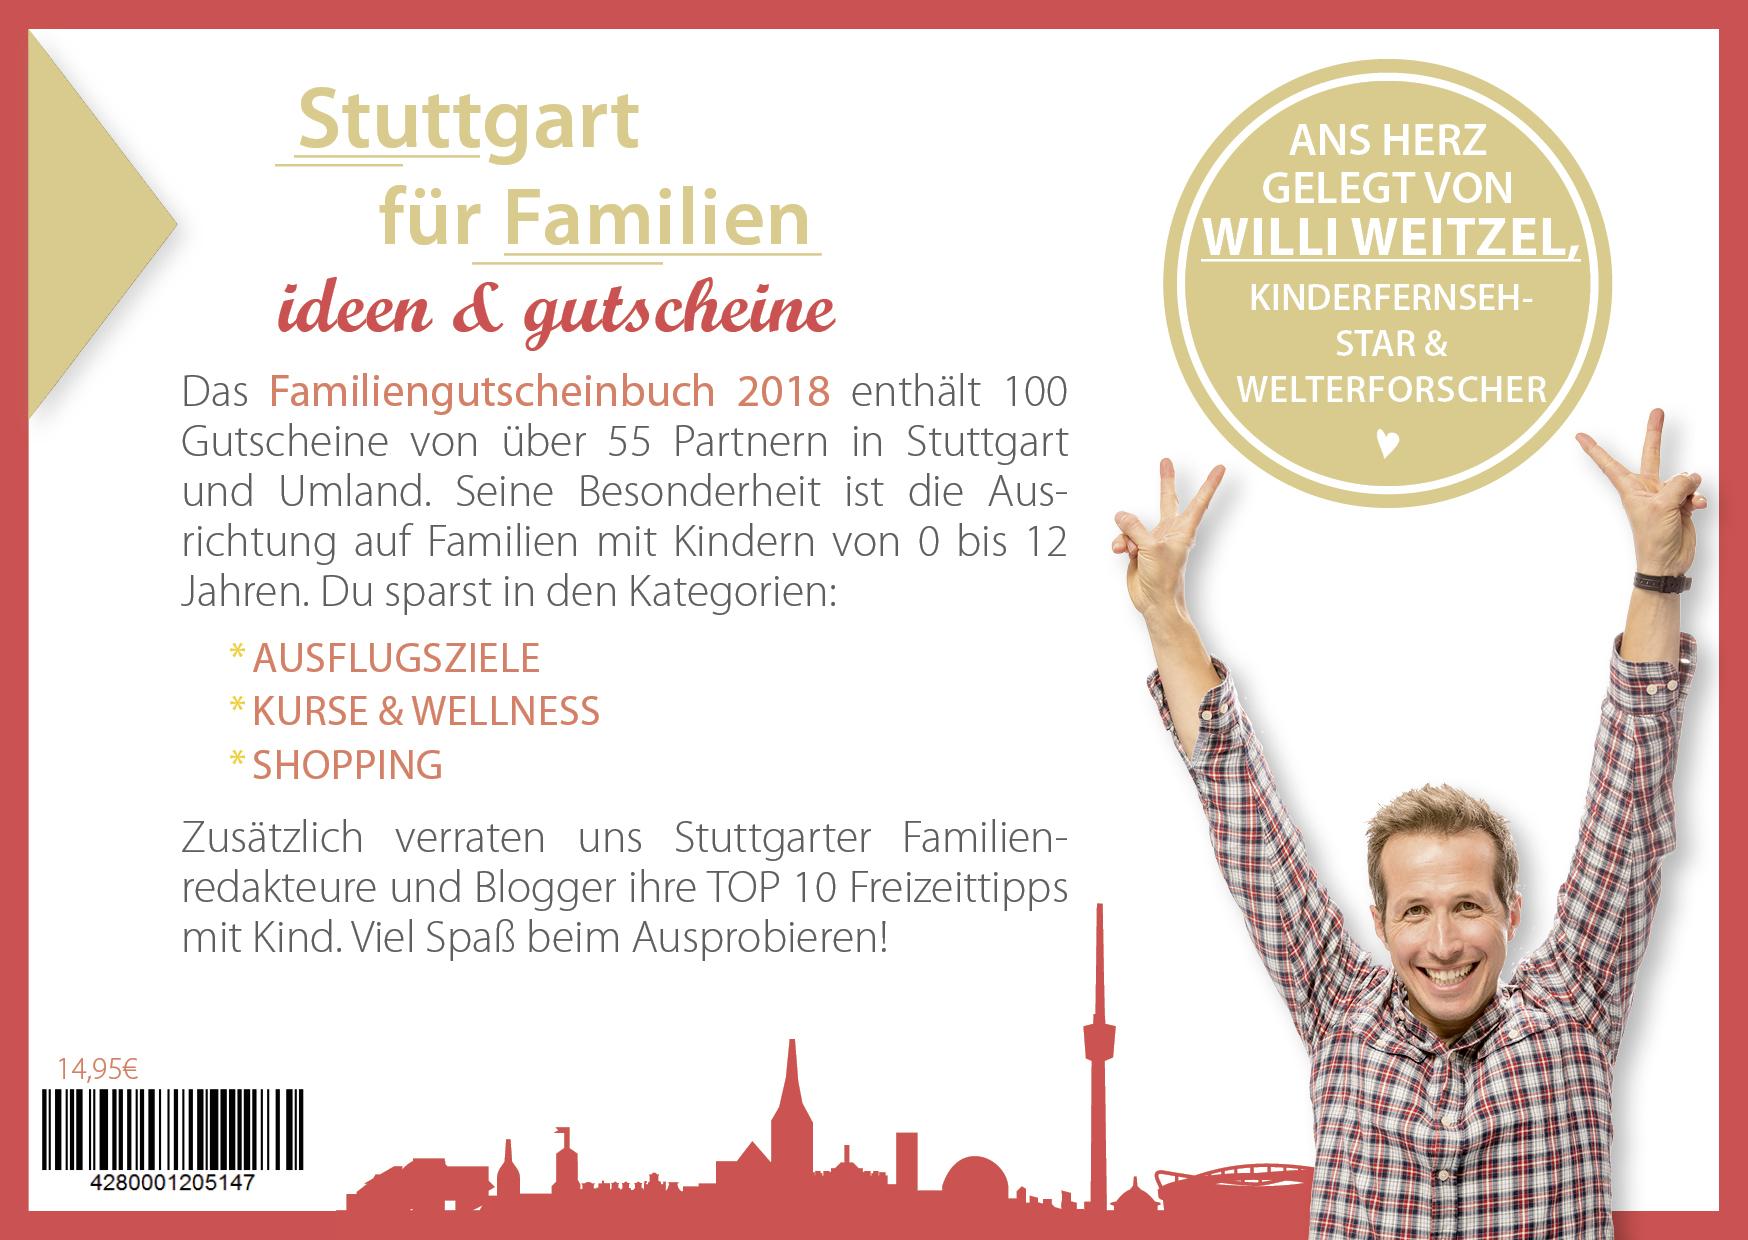 Familien Gutscheinbuch Cover Stuttgart Rueckseite 1 - Gutscheinbuch Stuttgart für Familien